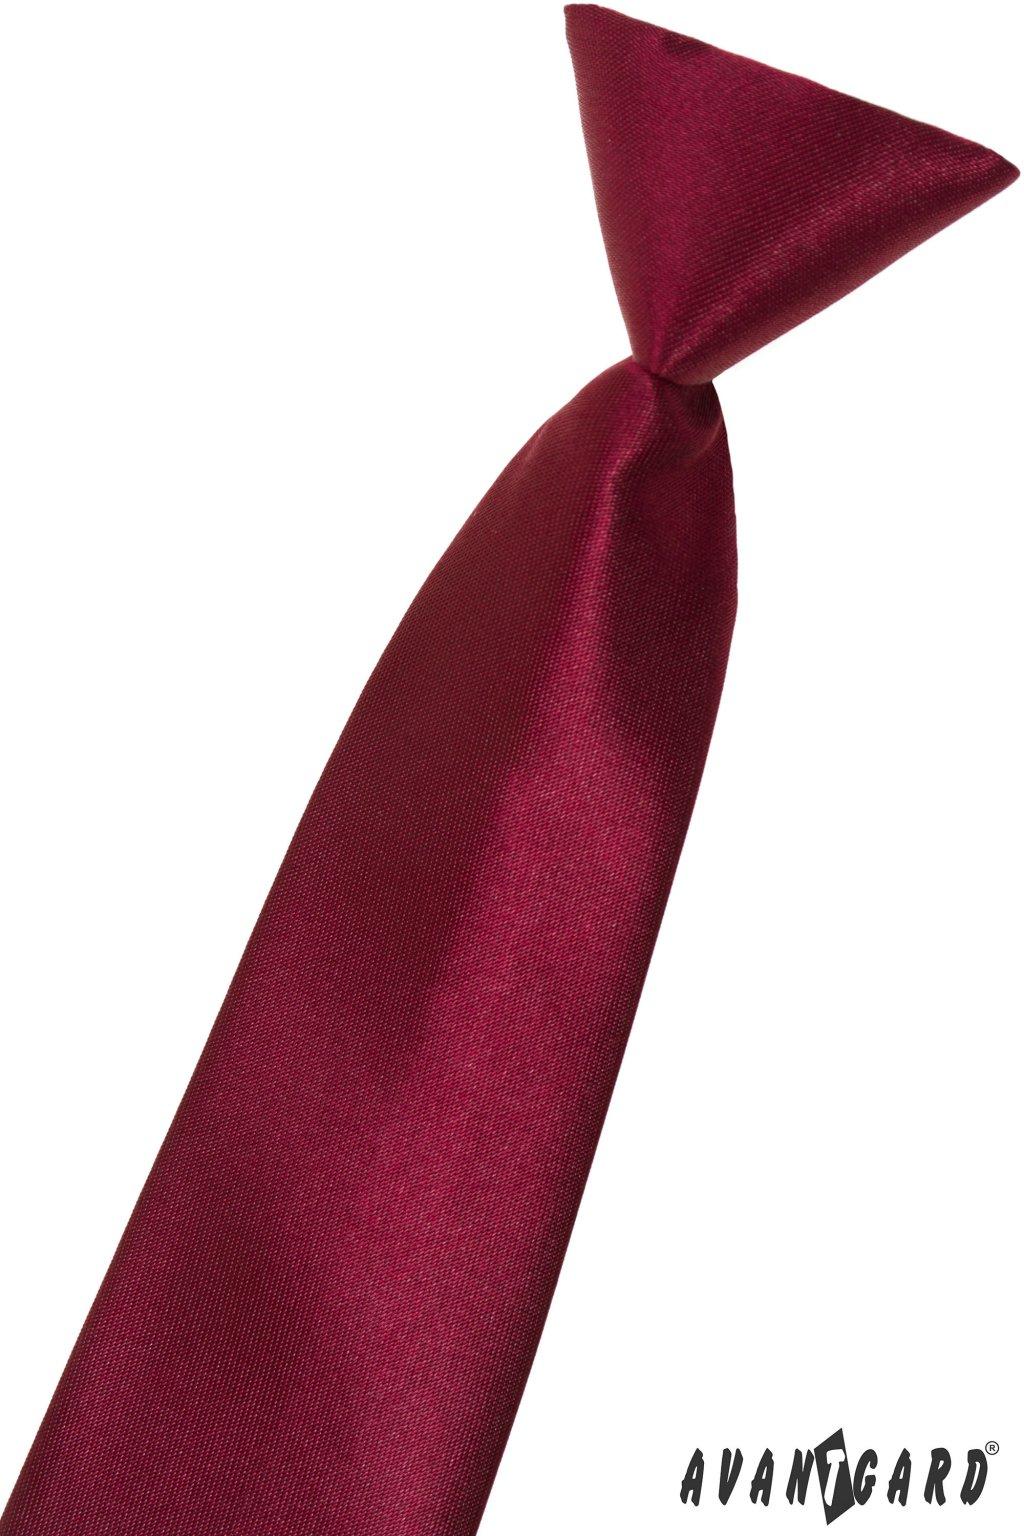 Chlapecká kravata bordó 558 - 754